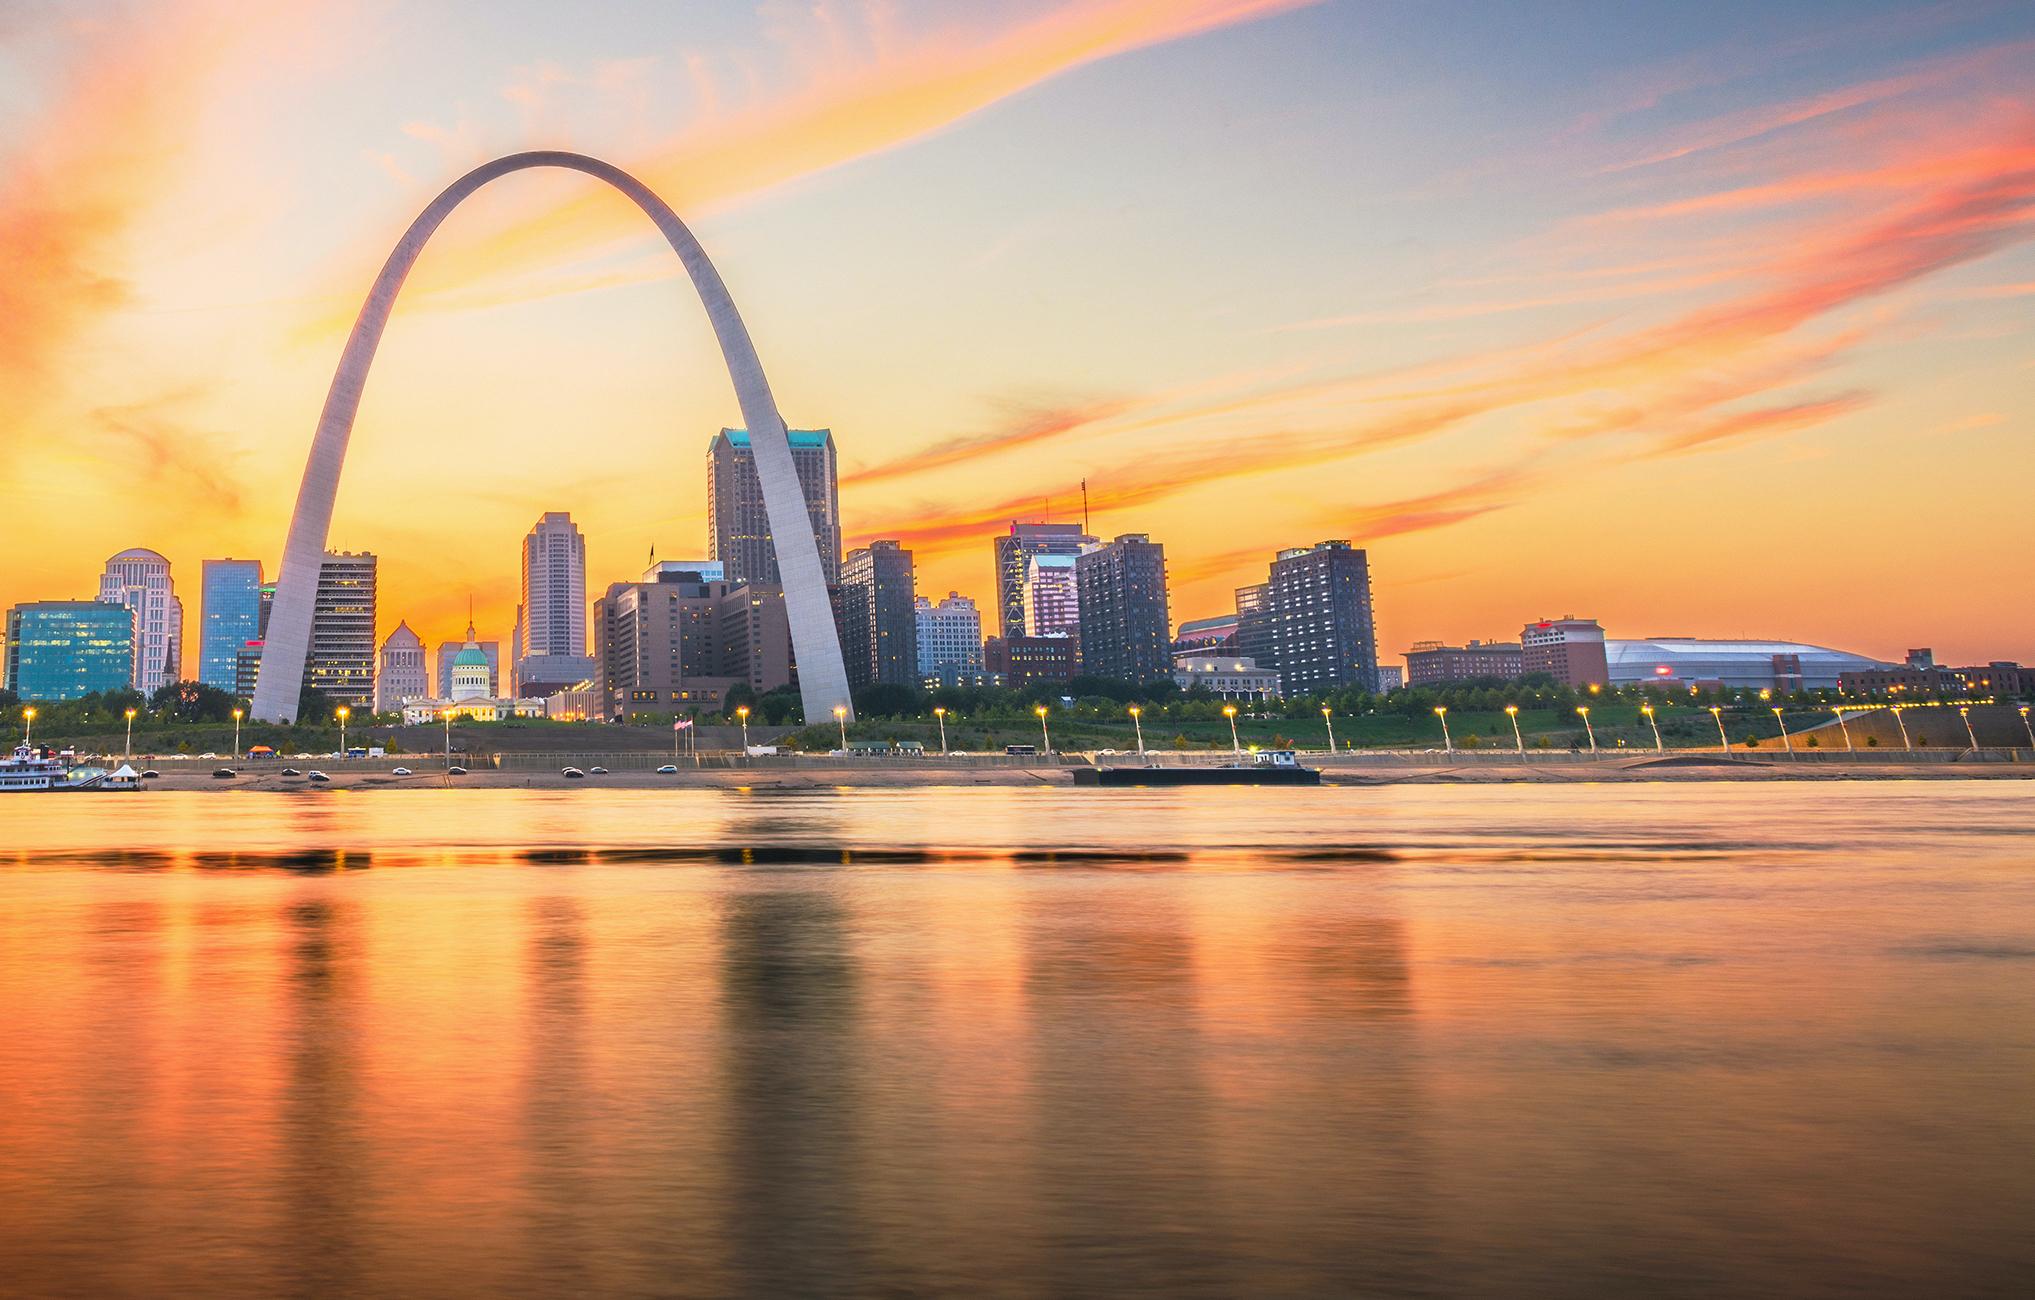 St. Louis, Missouri, USA skyline at sunset, taken from the water.